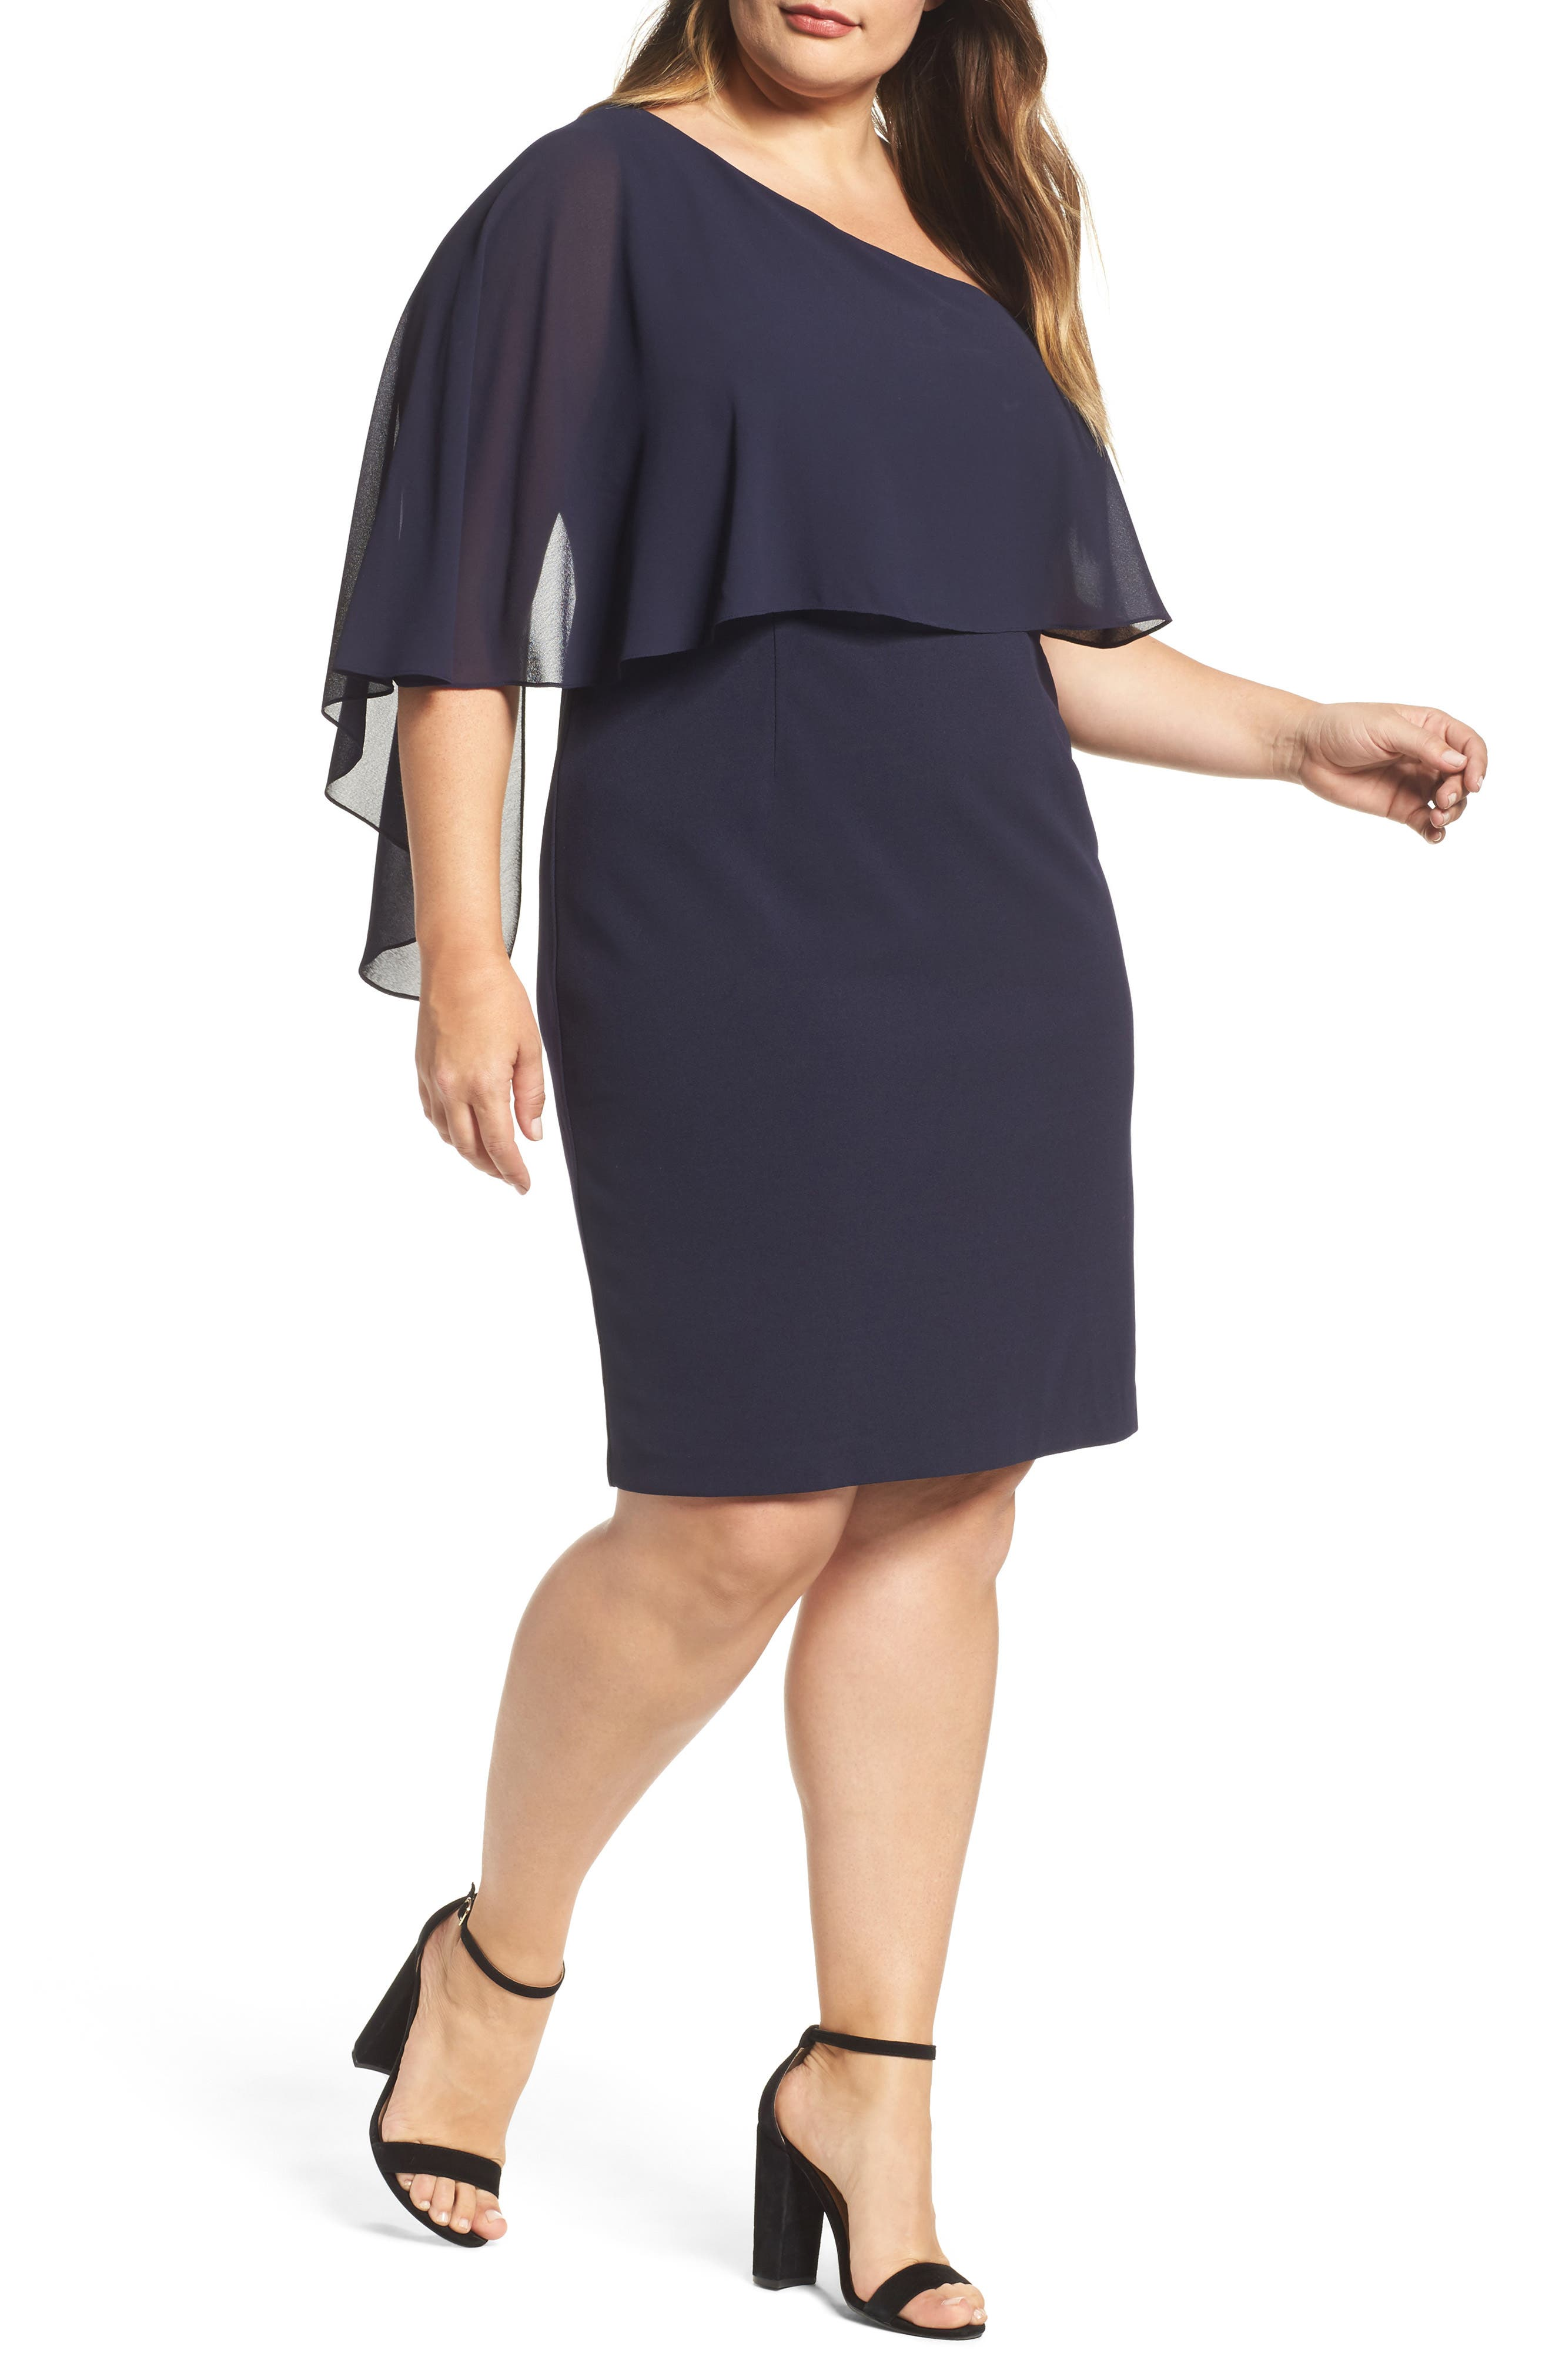 Vince Camuto One-Shoulder Sheath Dress (Plus Size)